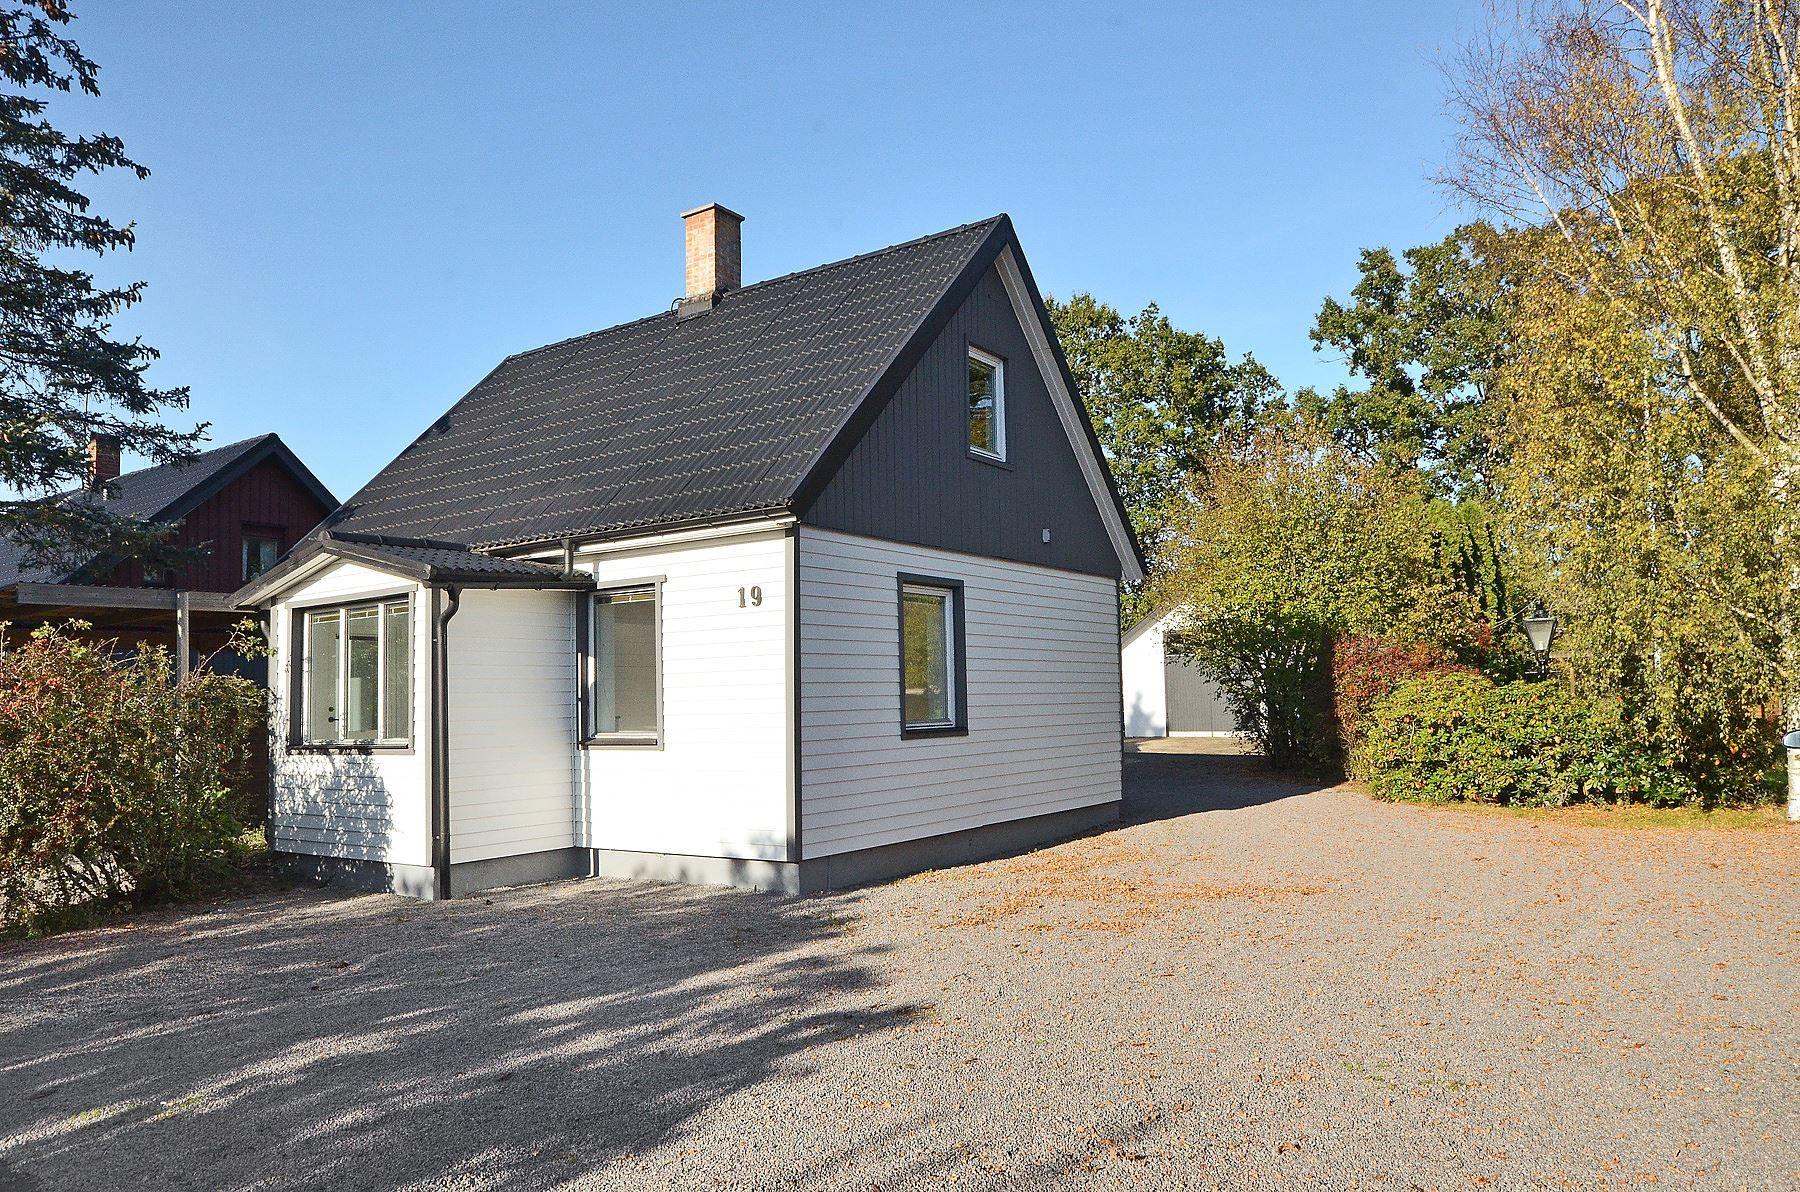 Vagnmakaregatan 19 Bjuv Husmanhagberg Din Lokala Fastighetsmaklare